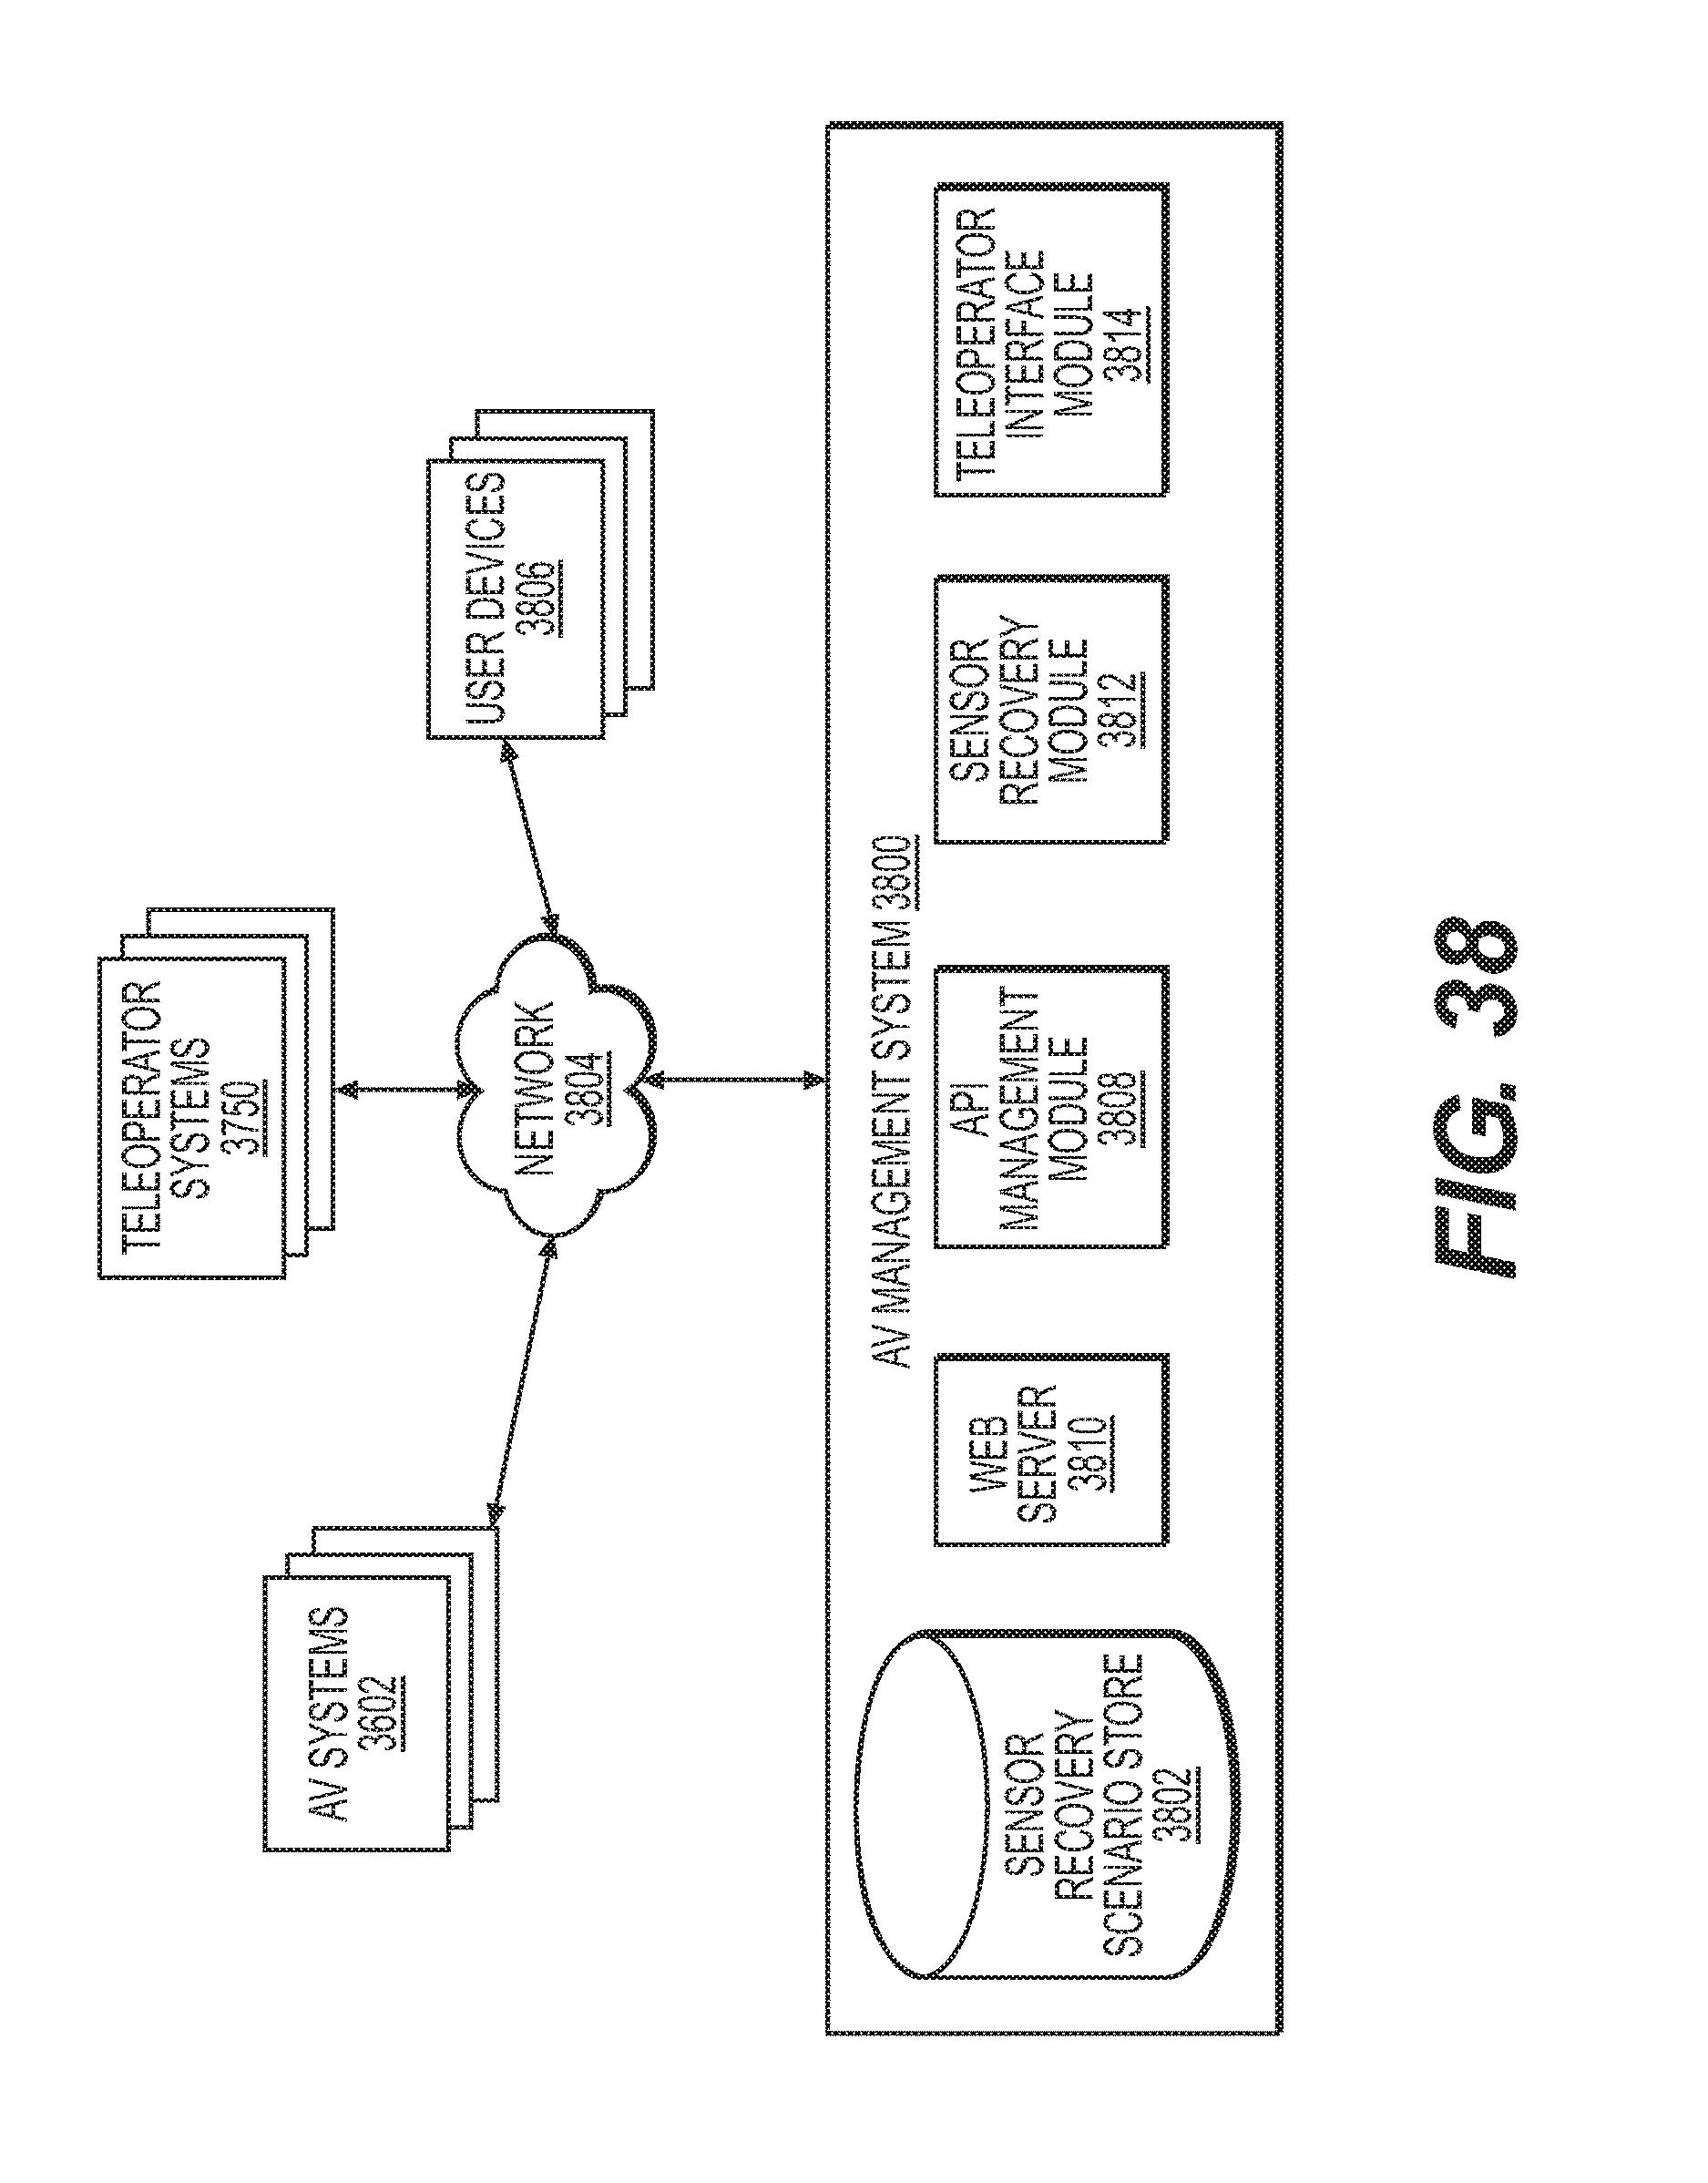 Patent Us 9720415 B2 2005 John Deere 3120 Fuse Box Diagram 0 Petitions